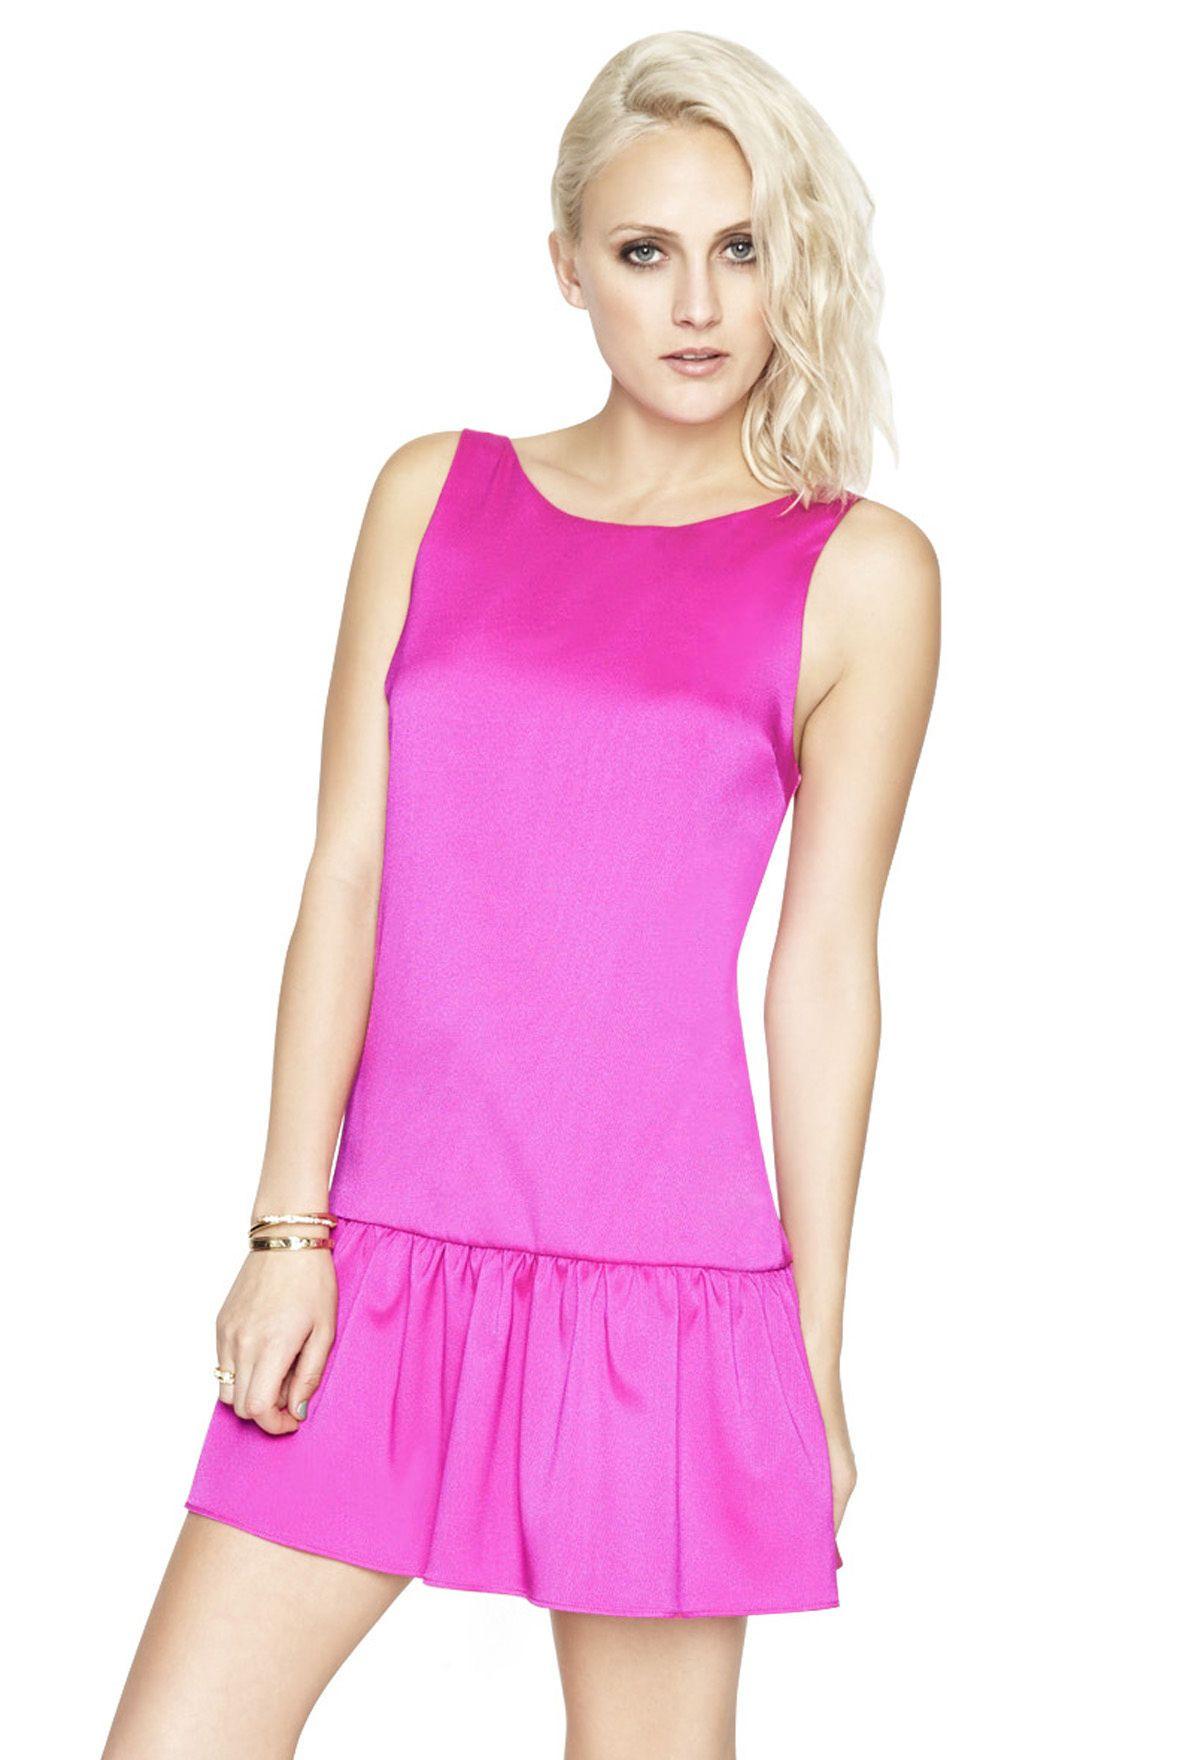 Full-Skirt Shift Dress | My Stylishousness | Pinterest